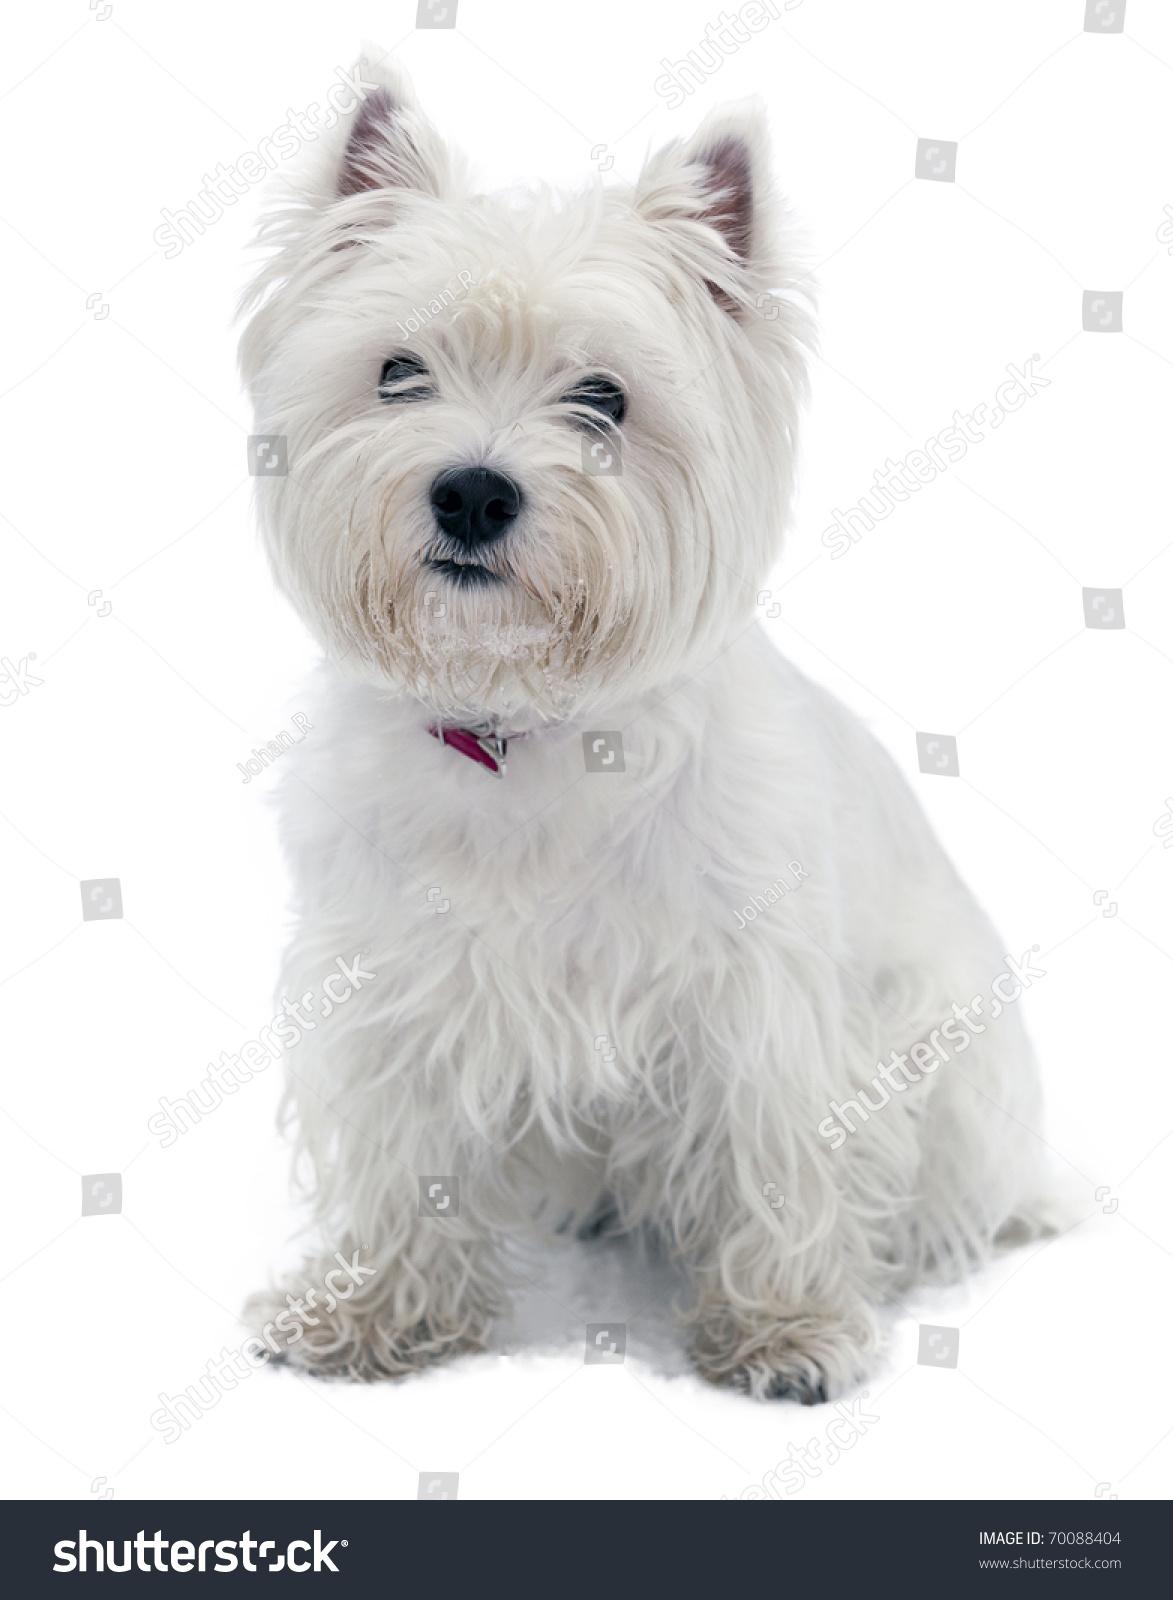 West Highland White Terrier Stock Photo 70088404 - Shutterstock